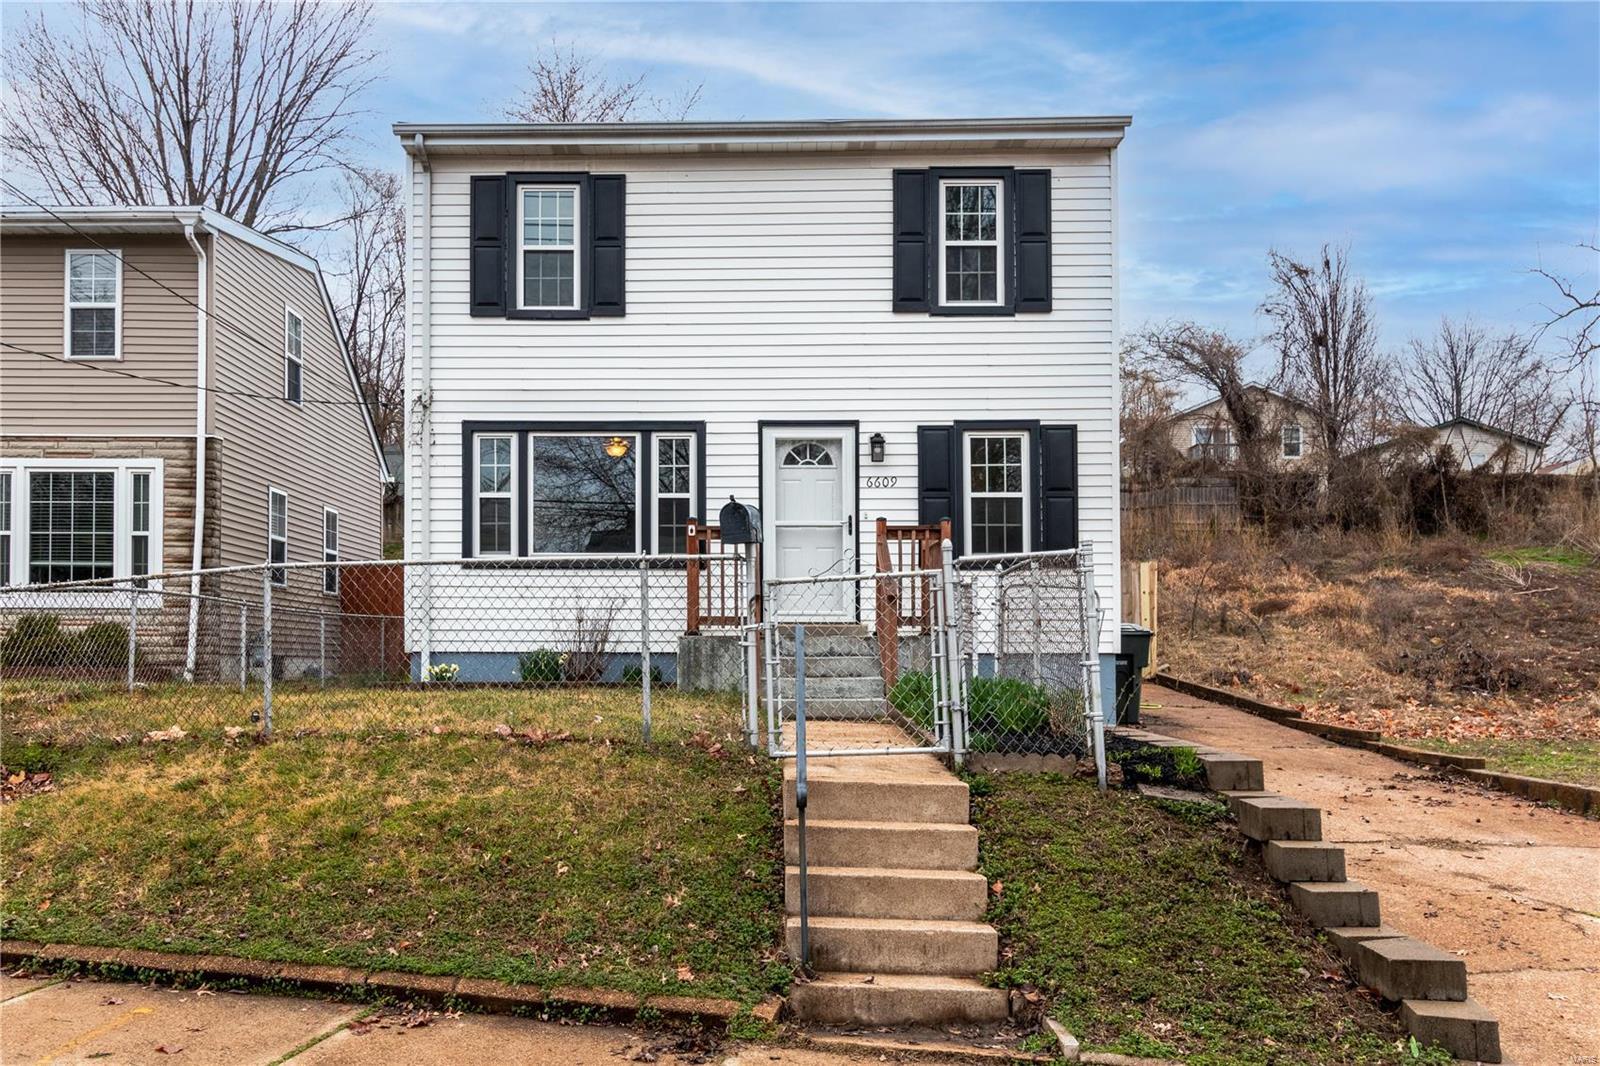 6609 Dale Avenue Property Photo